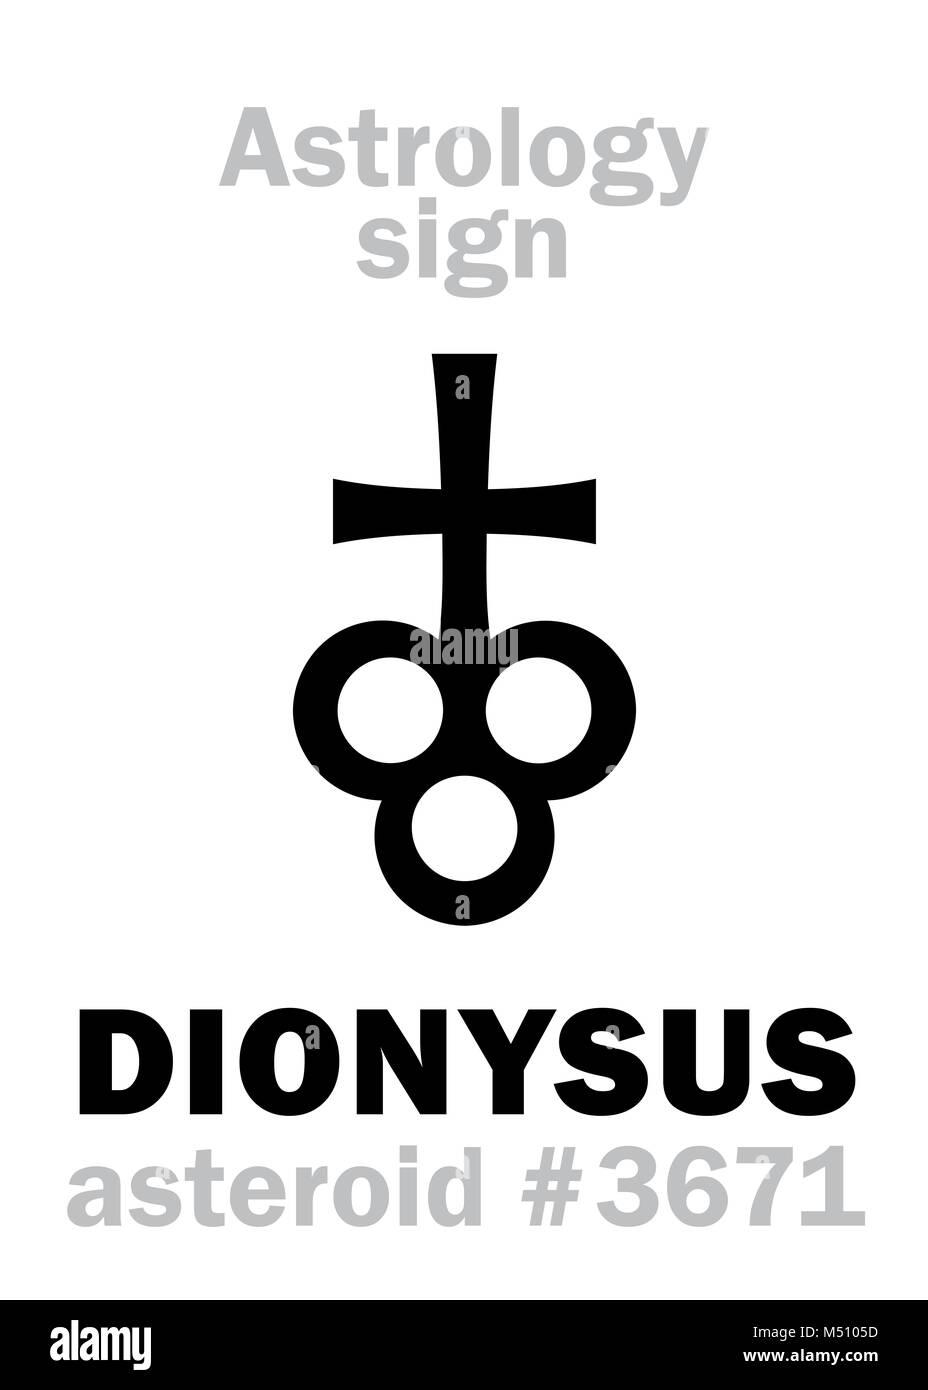 Astrology Asteroid Dionysus Stock Photo 175199065 Alamy